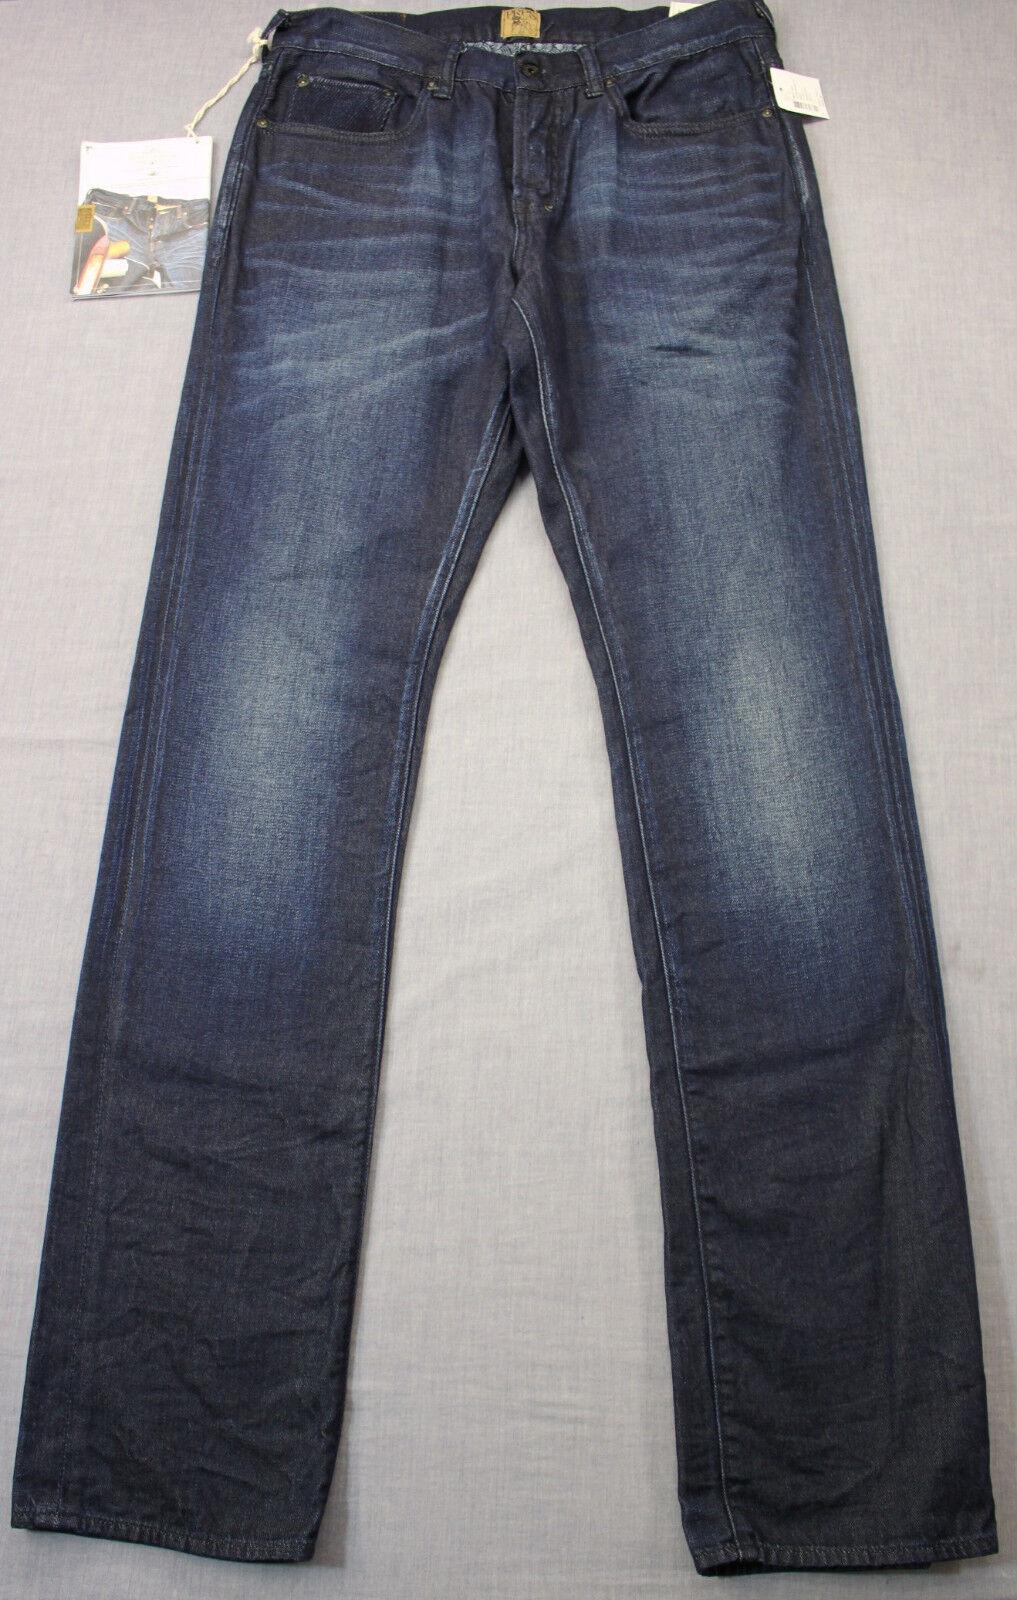 PRPS Demon Mens Monoceros Indigo bluee Slim Fit Straight Denim Jeans NWT 30 x 34